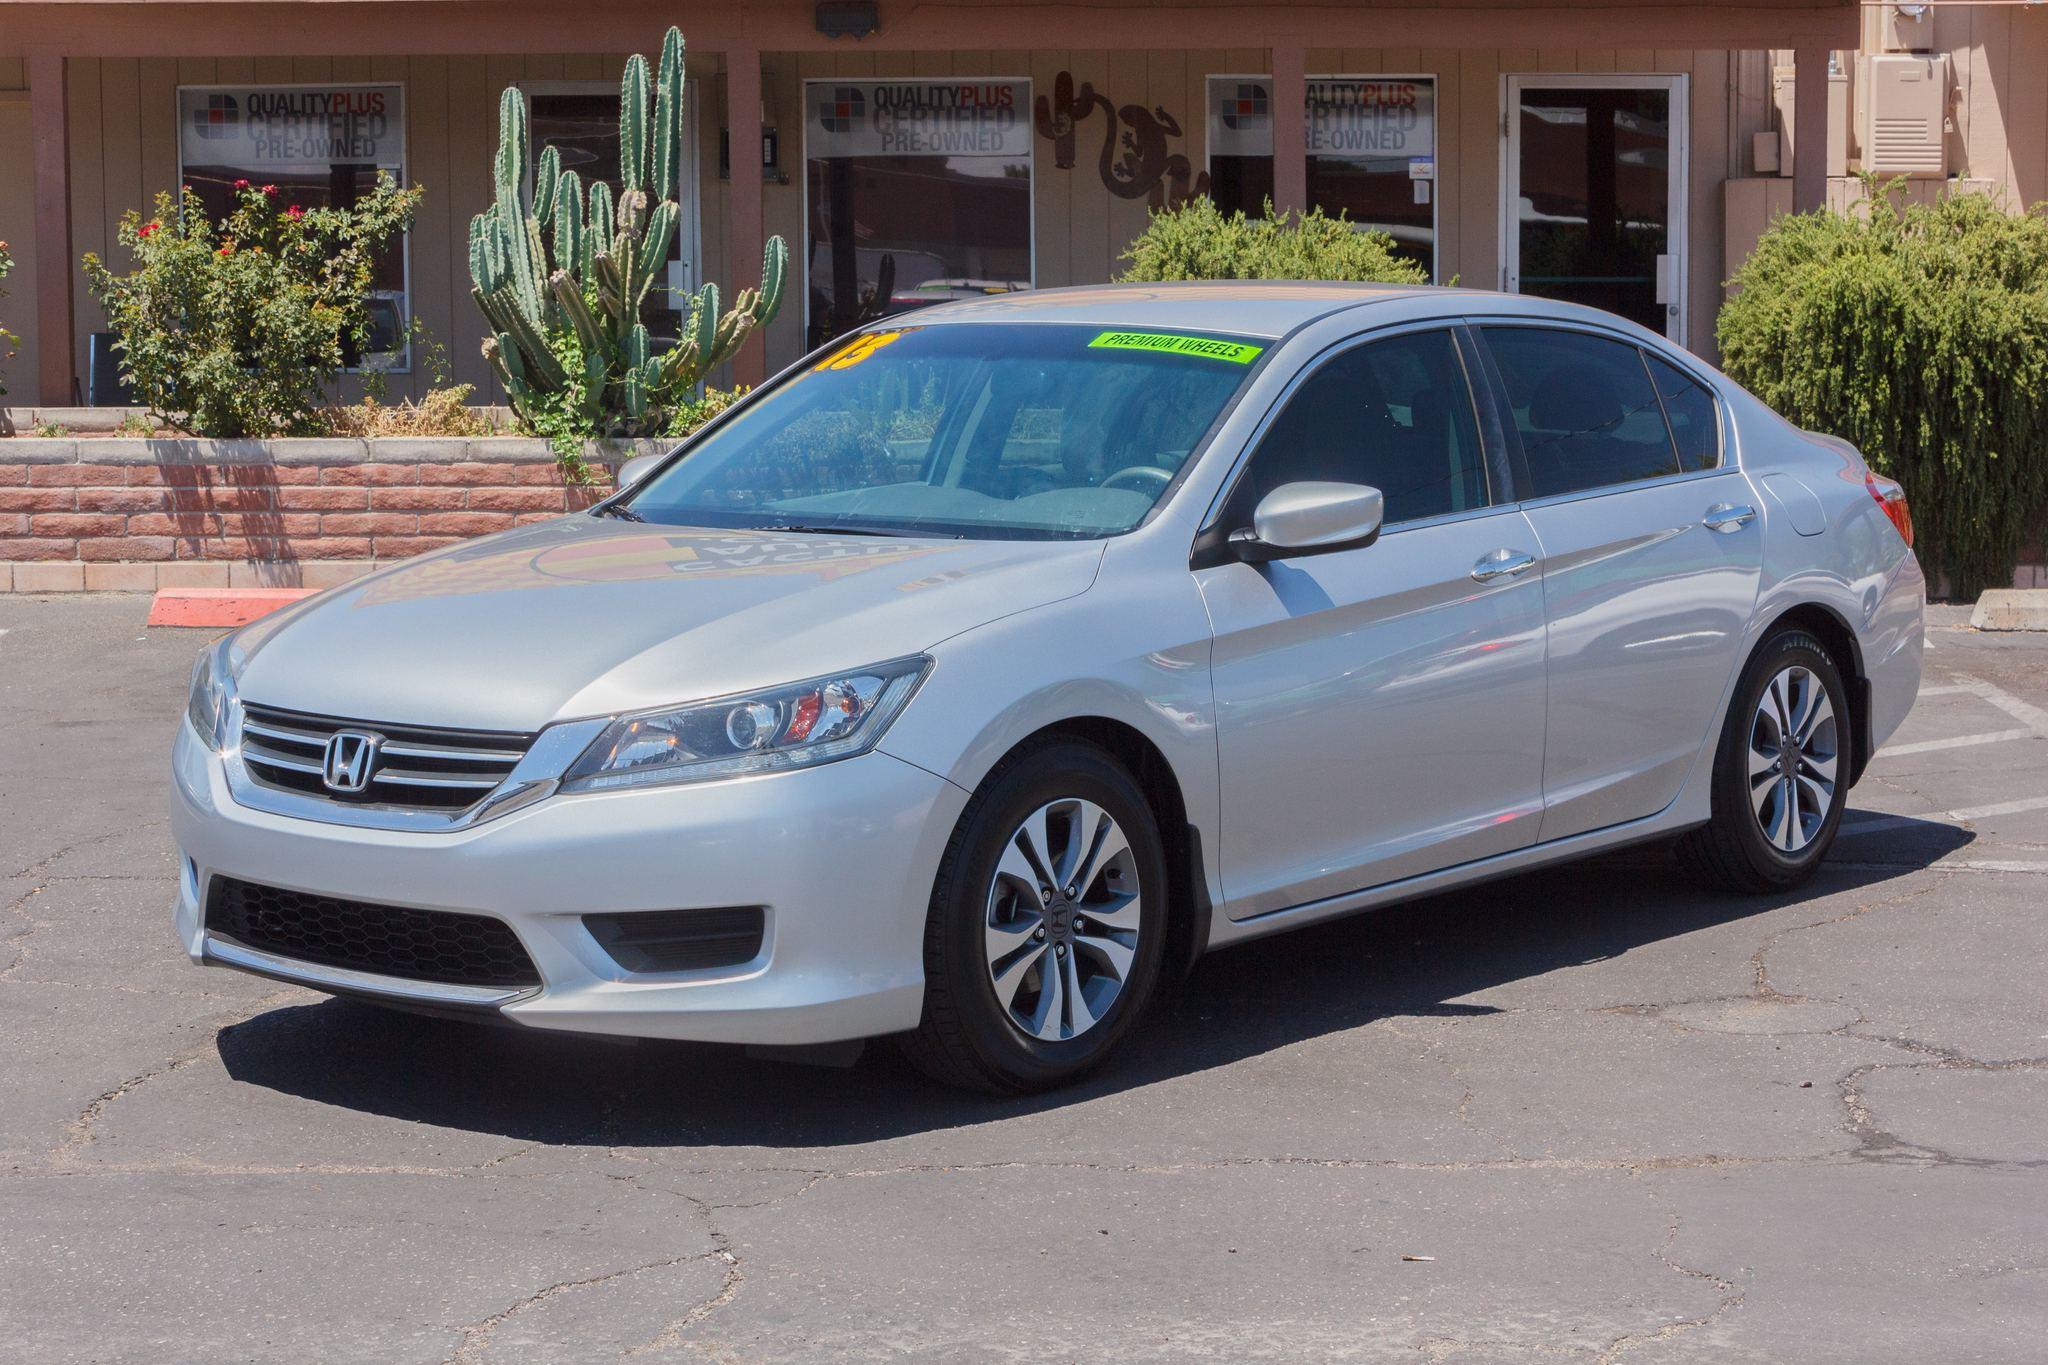 Photo of 2013 Honda Accord Sedan 4d Sedan LX CVT Alabaster Silver Metallic